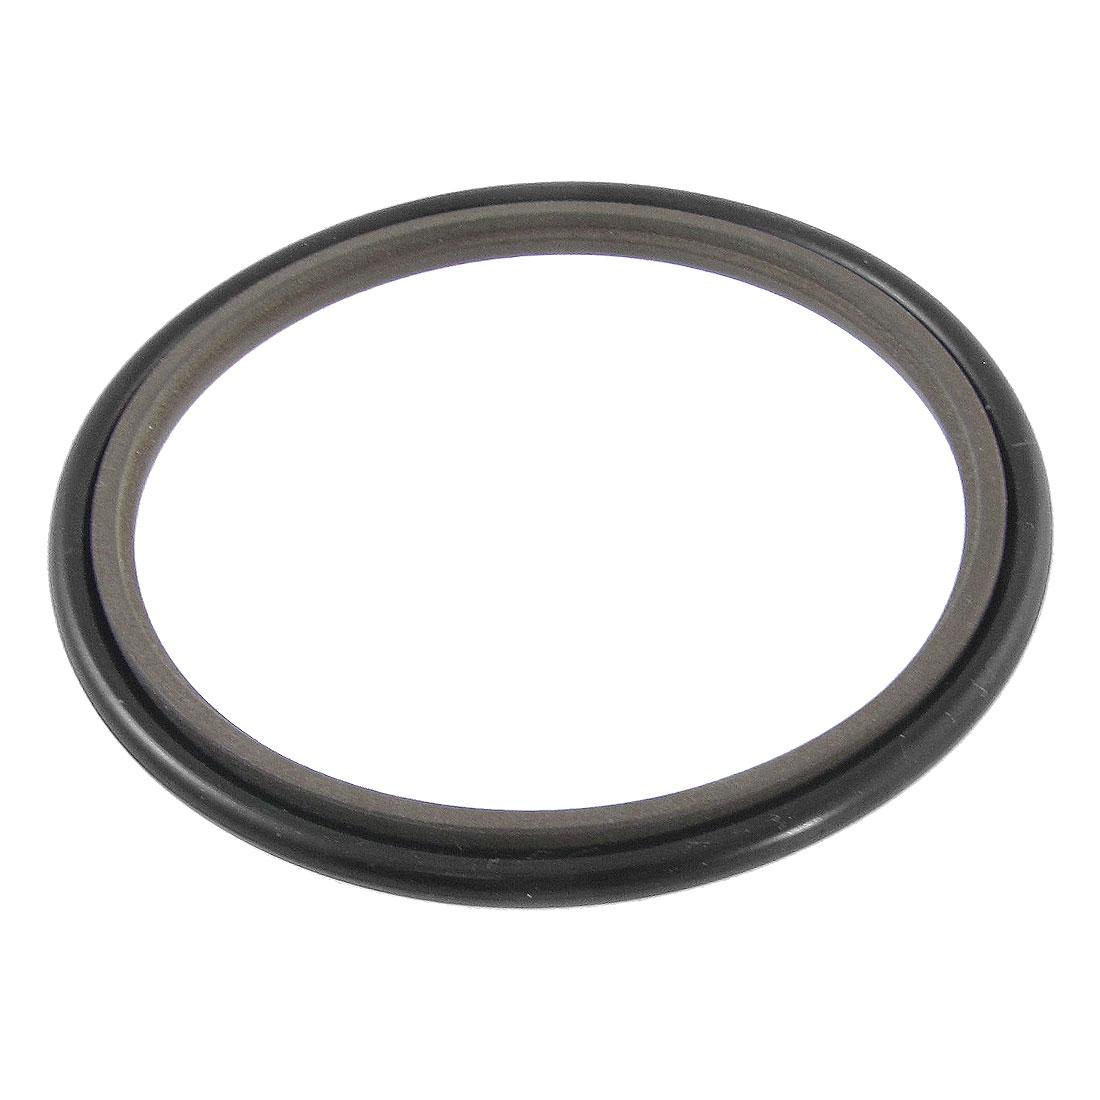 Peumatic PTFE NBR Piston Rod Step Seal Ring 60 x 71 x 4.2mm